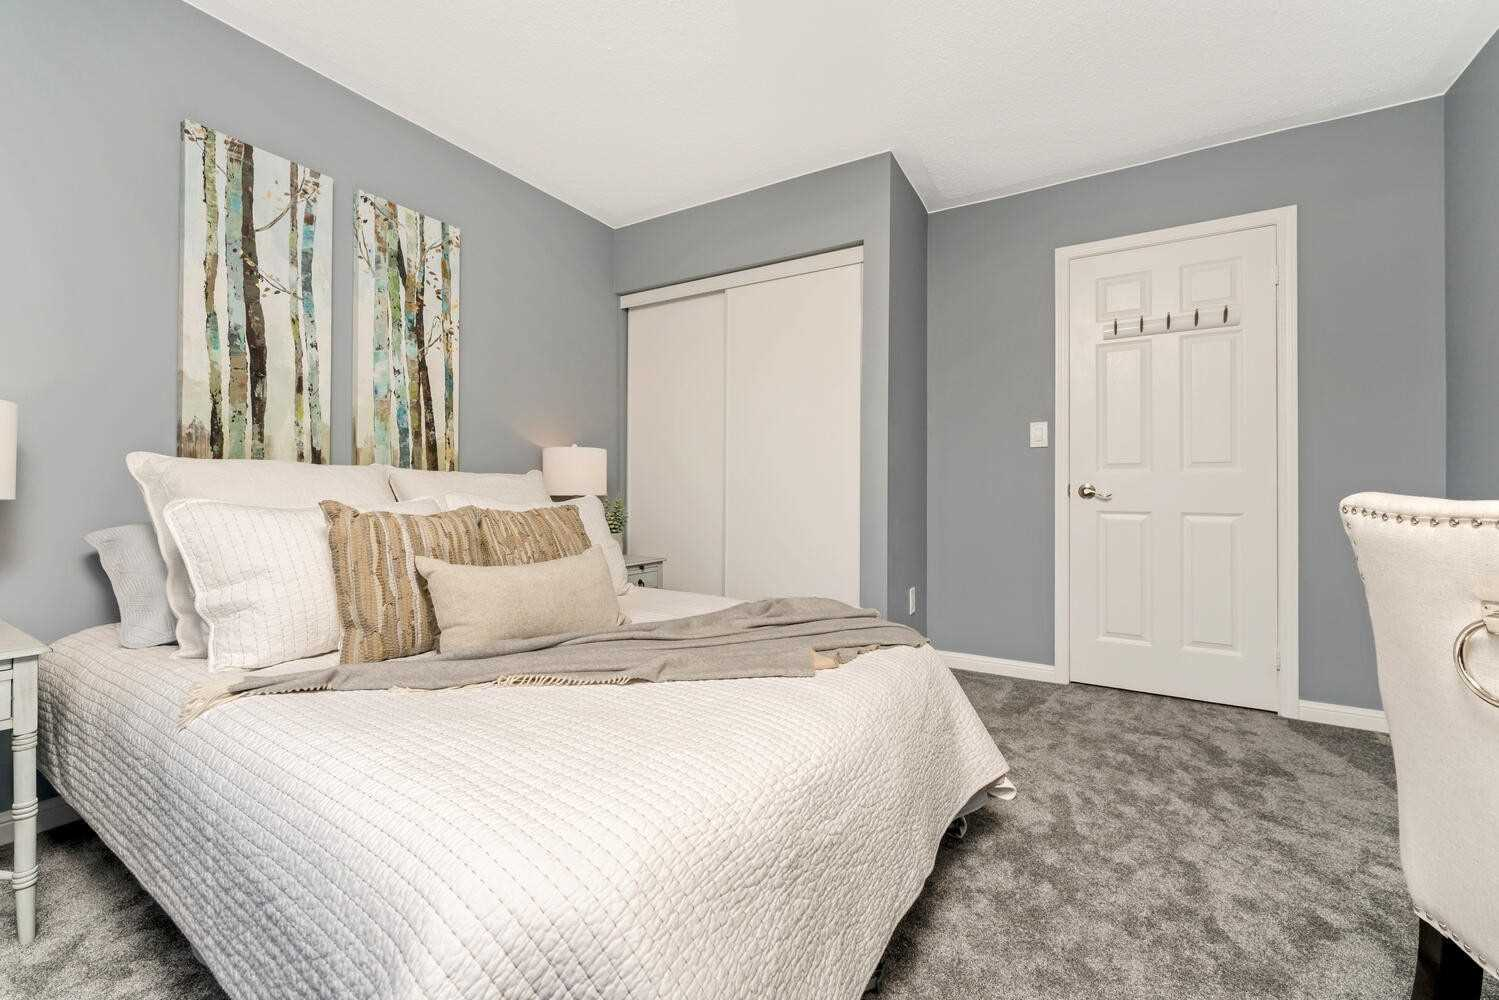 1030 Barclay Circ - Beaty Att/Row/Twnhouse for sale, 3 Bedrooms (W5400435) - #19